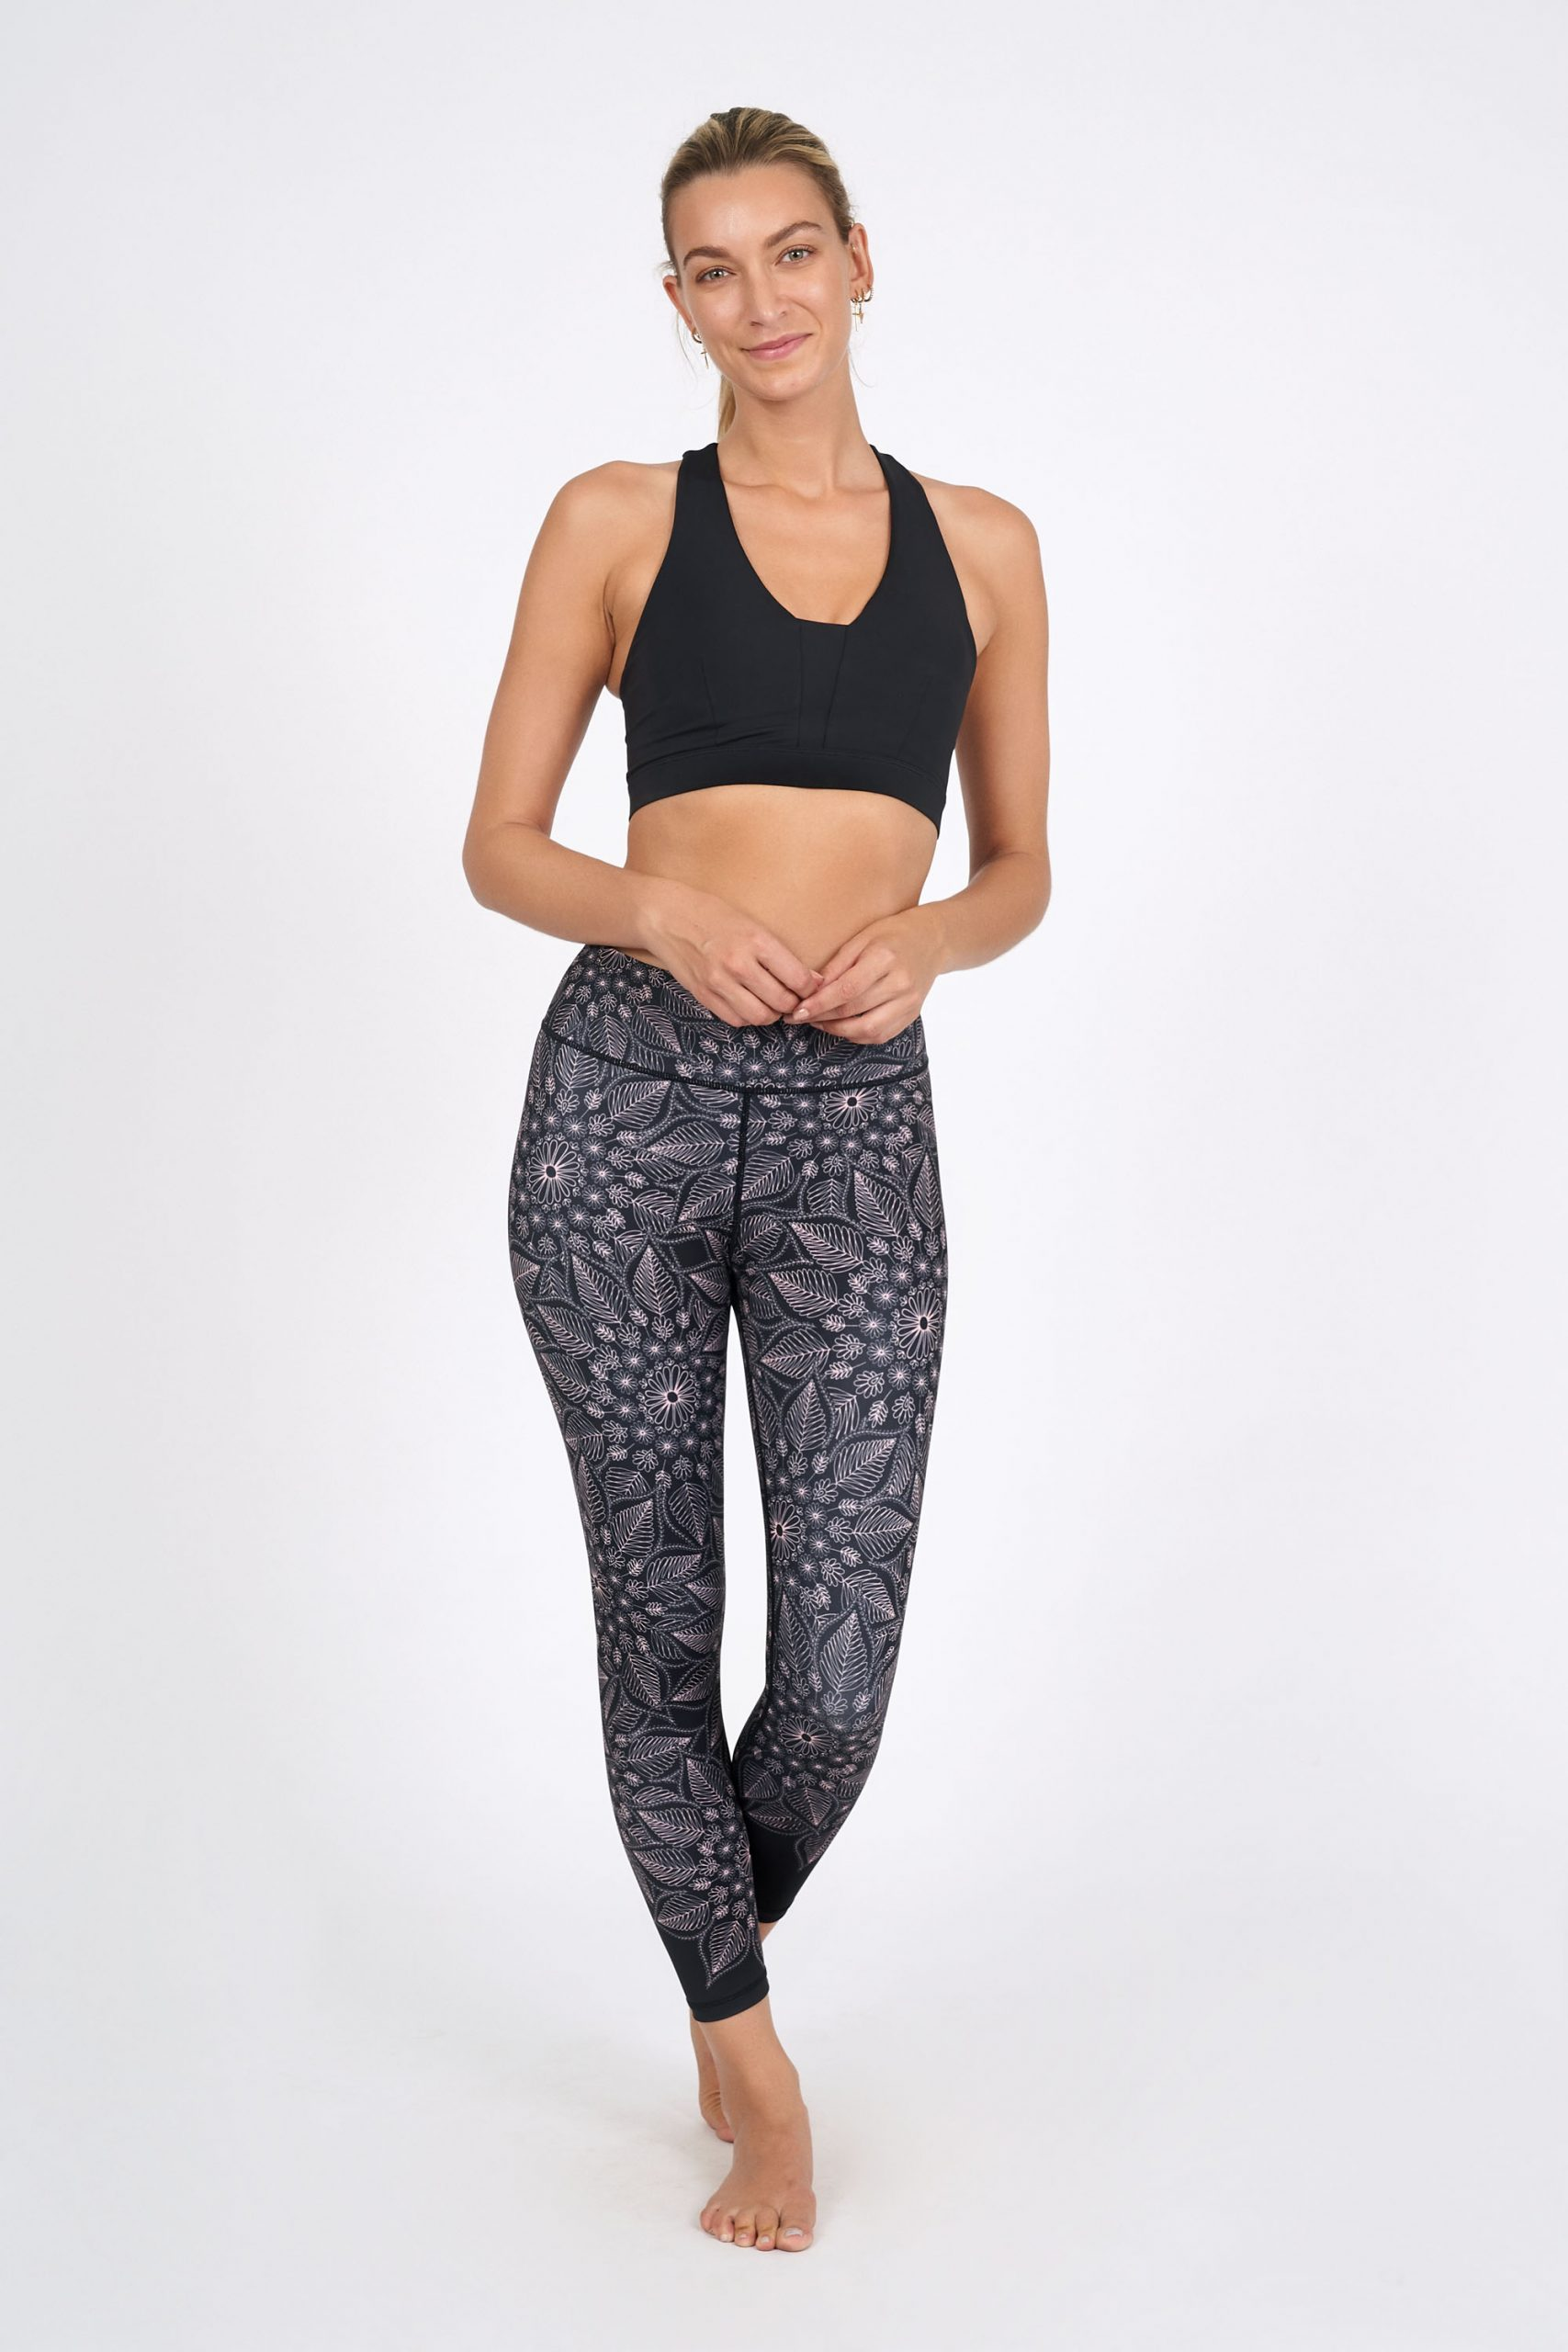 Dharma Bums Recycled Eco Yoga Leggings Acapella